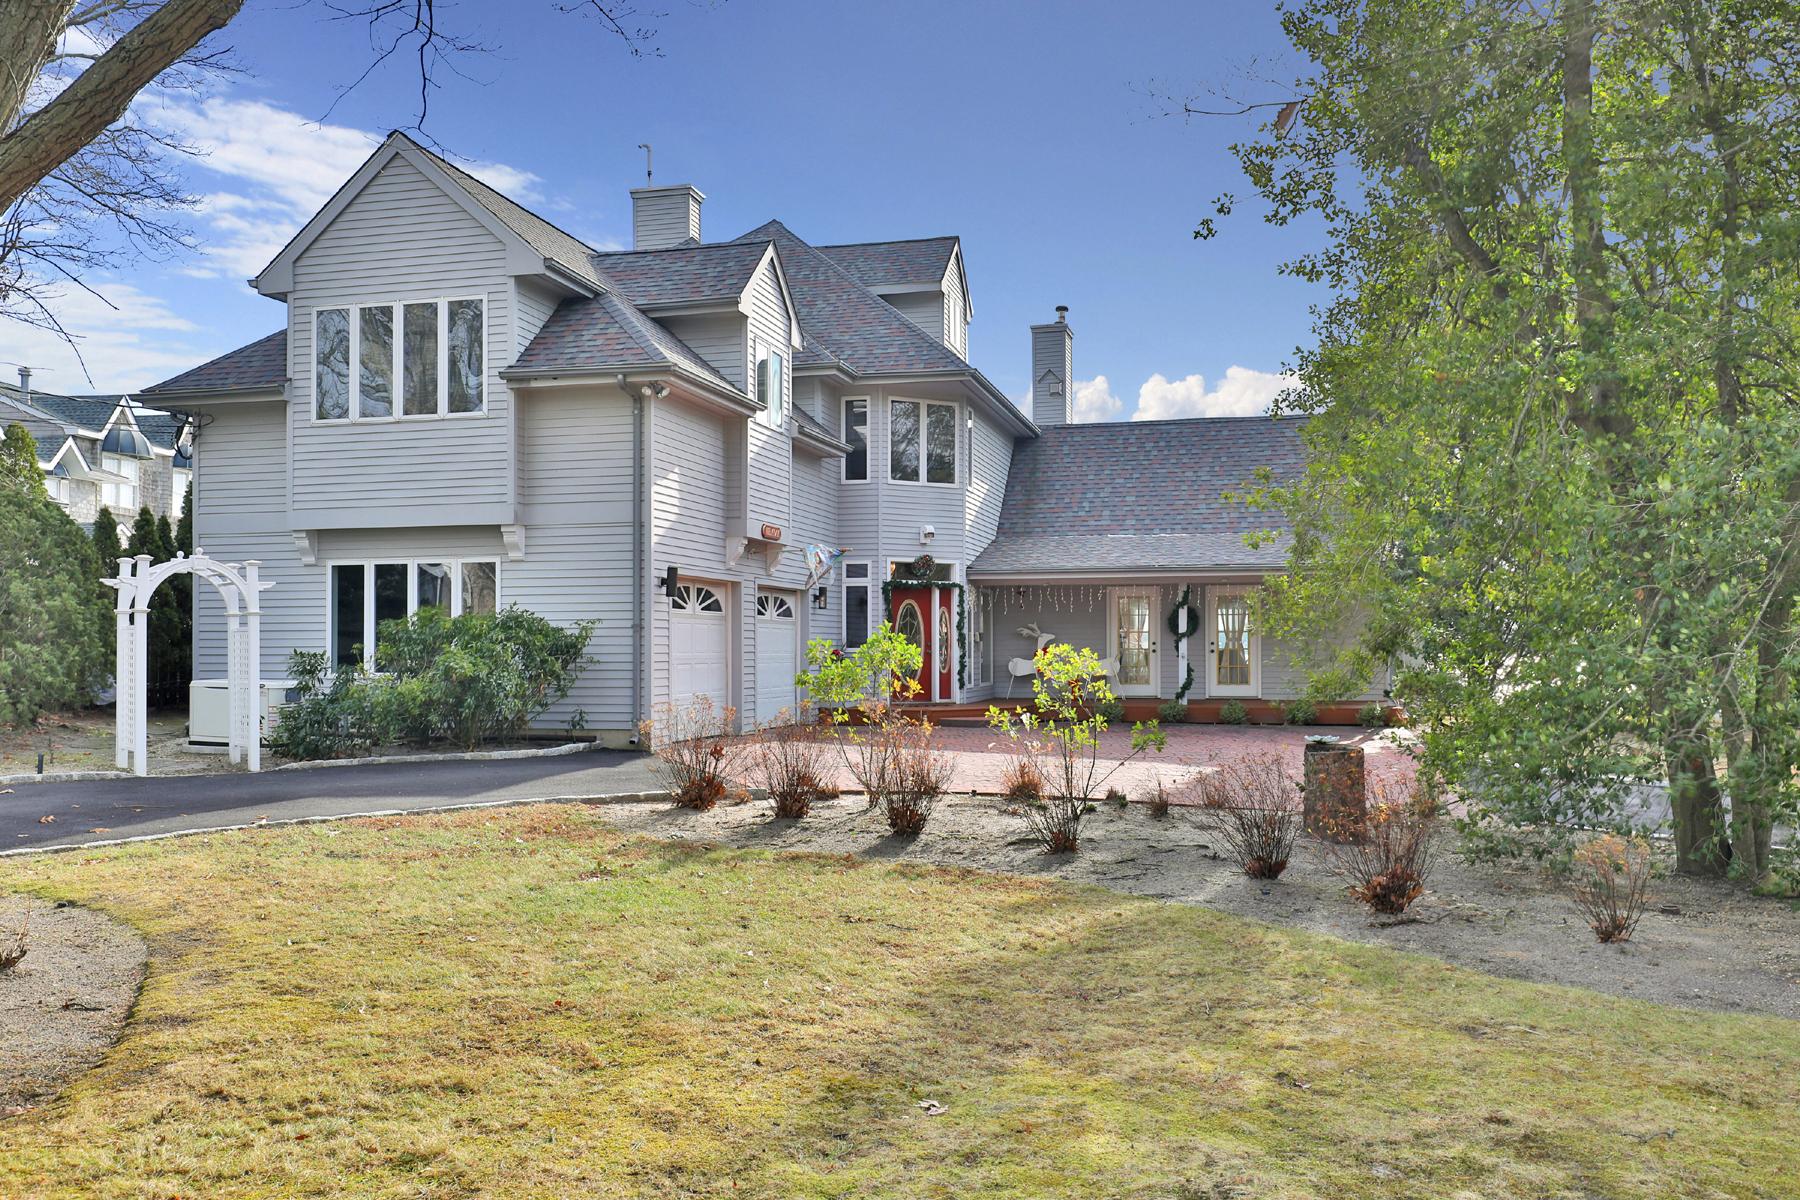 独户住宅 为 销售 在 Spectacular River Views At Every Angle 523 Princeton Avenue 布里克, 08724 美国